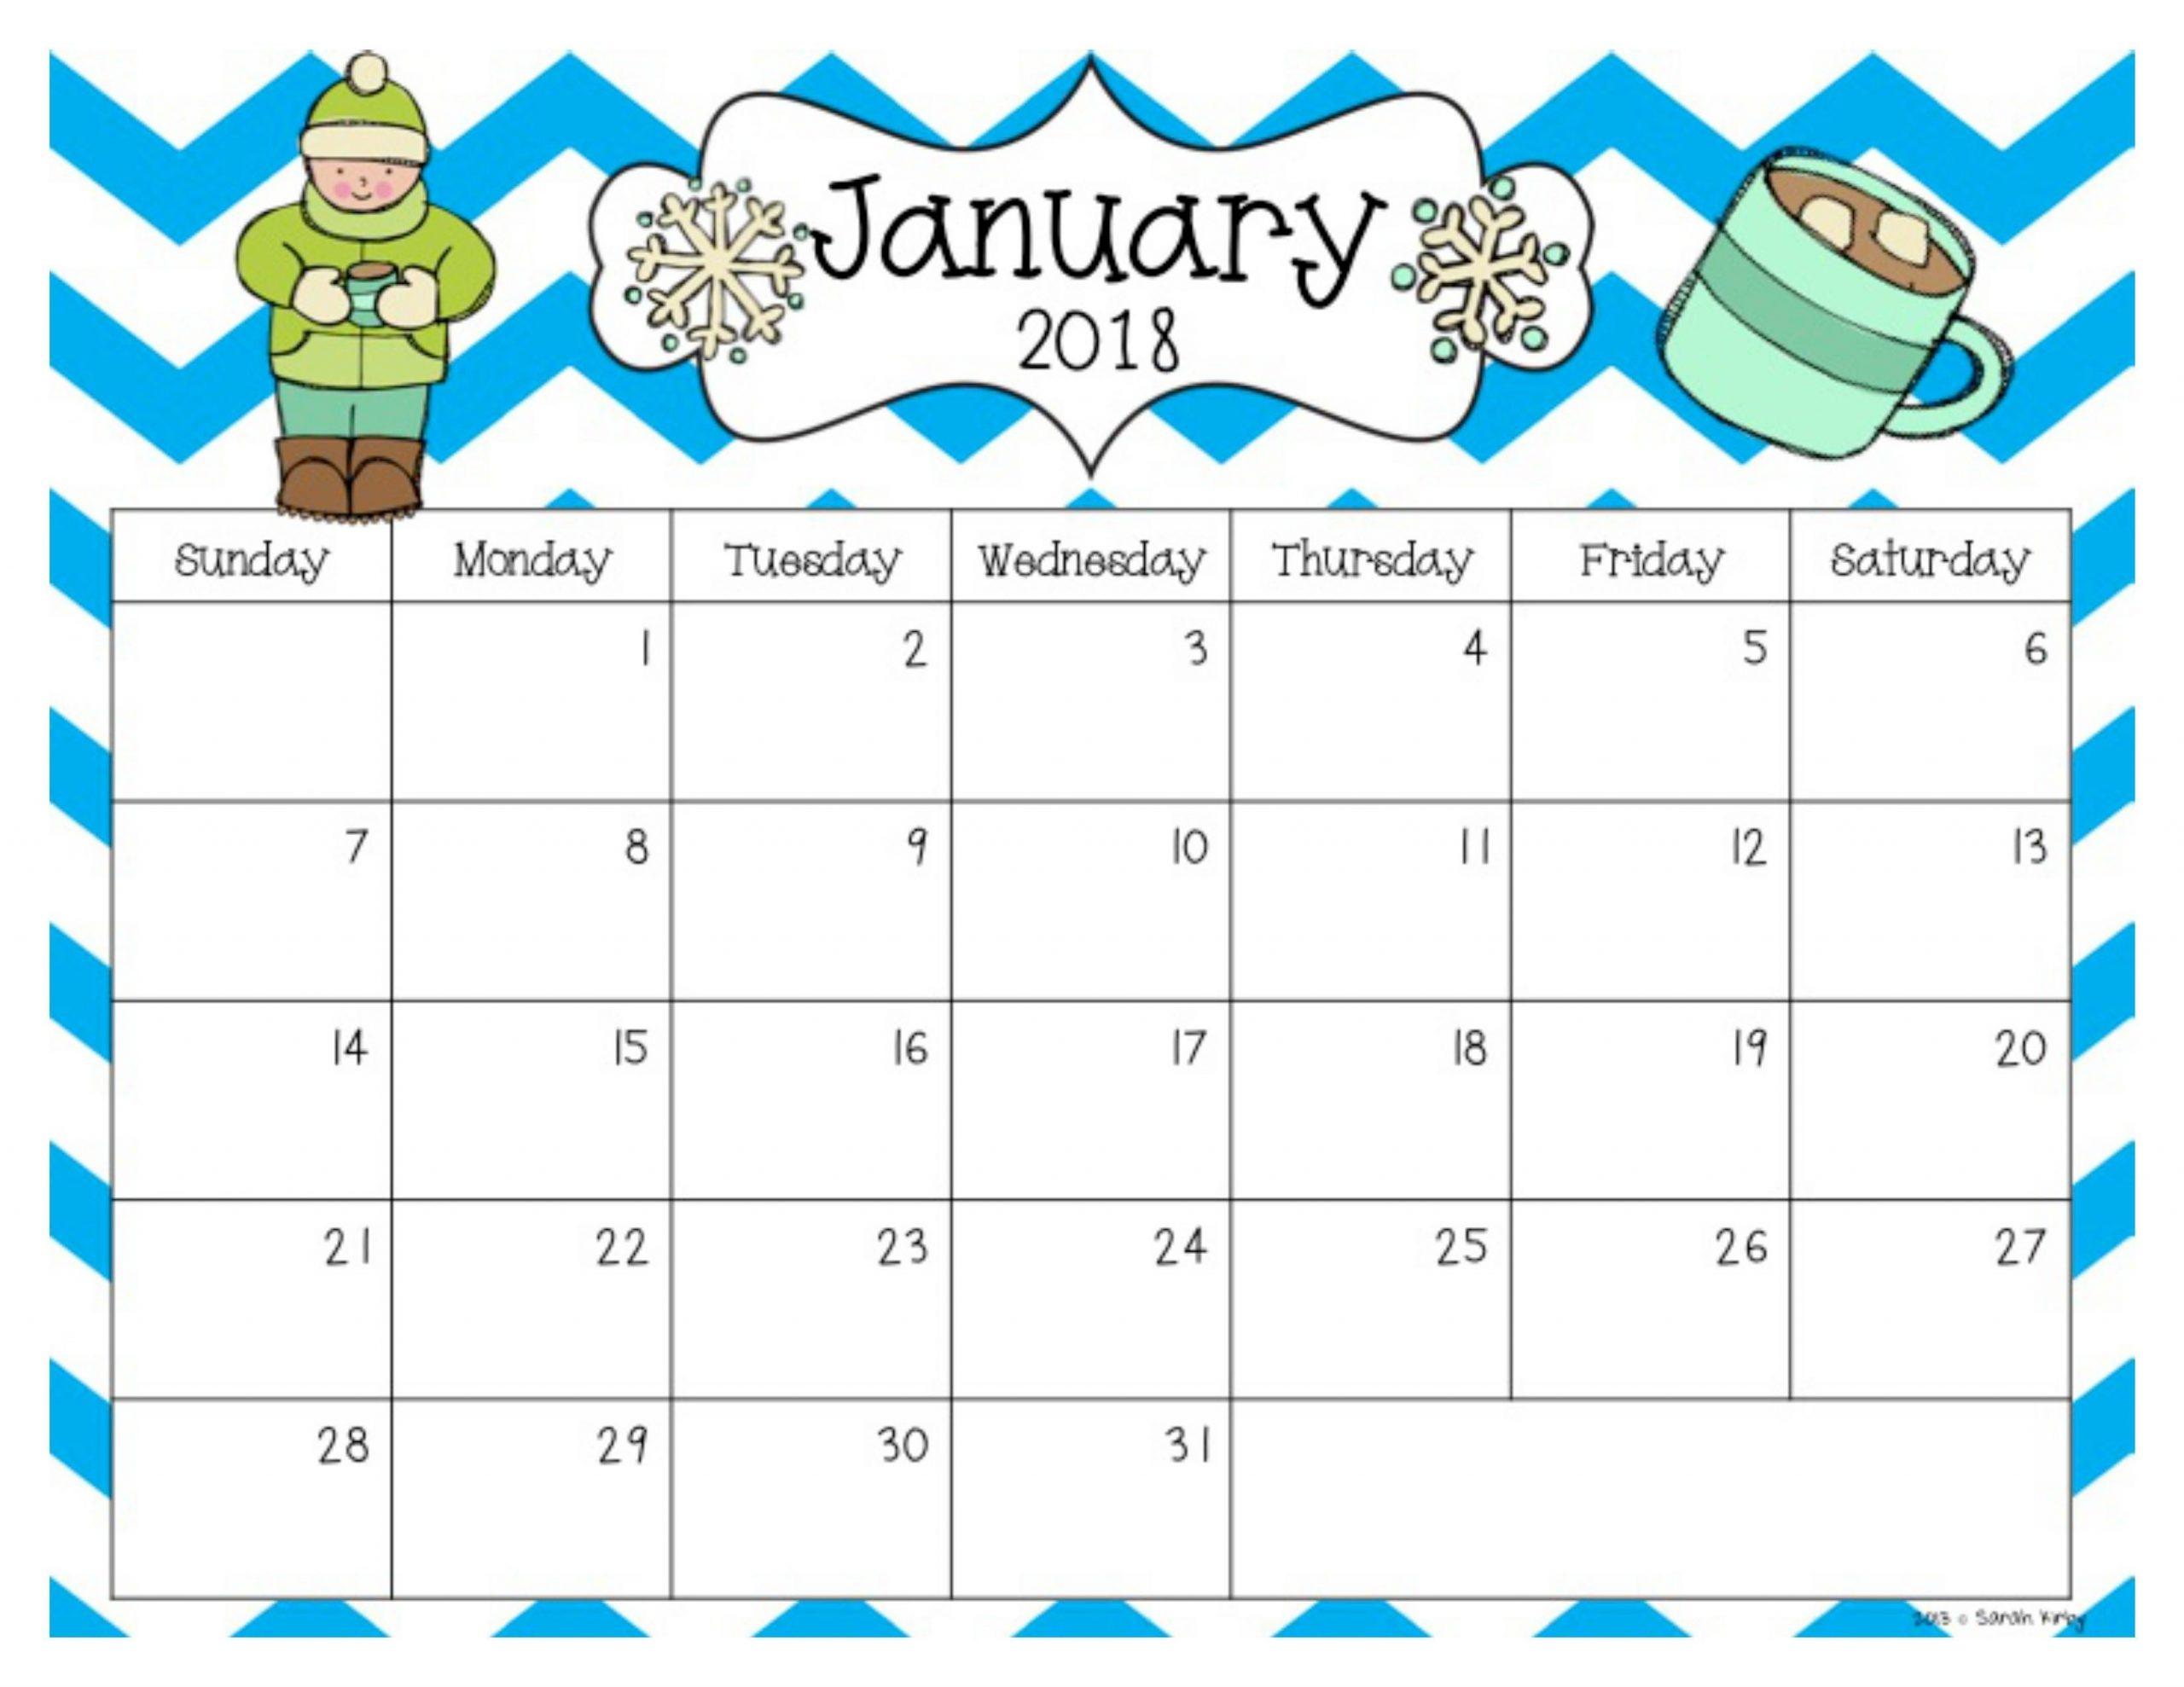 Free 2018 And 2019 Calendar | School Calendar, Preschool Calendar, Classroom Calendar-Blank I 9 Form 2021